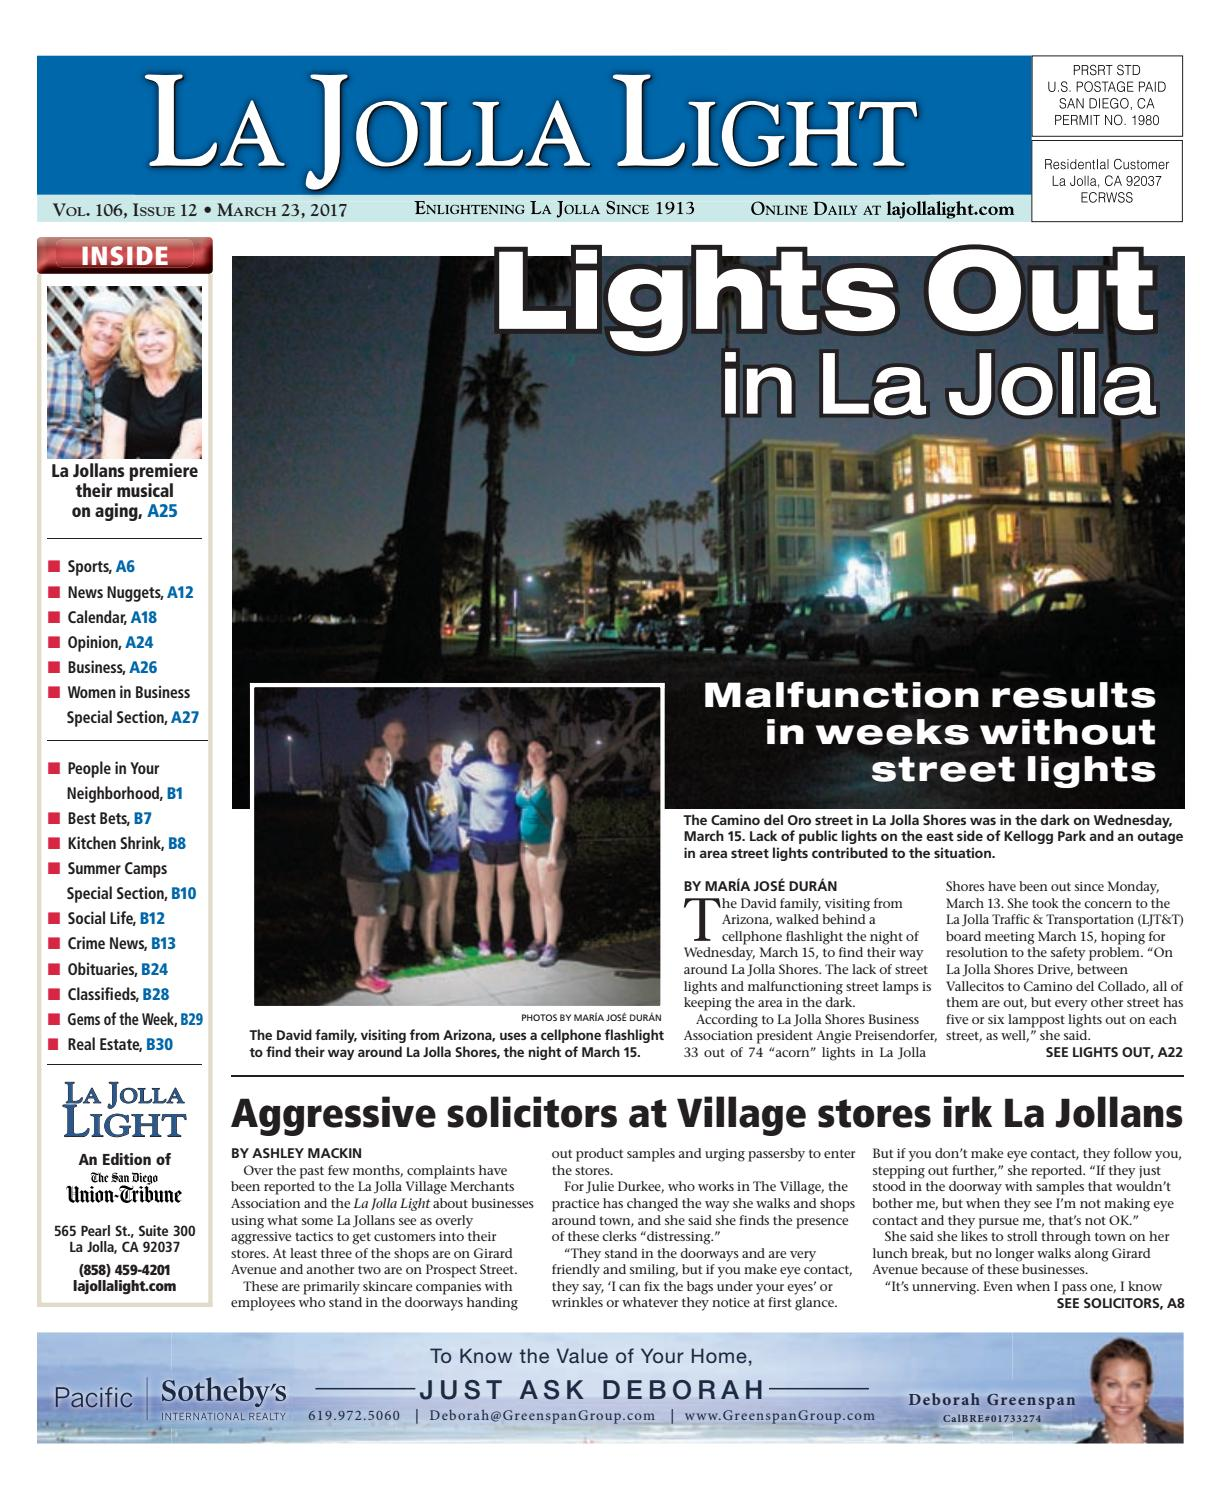 La jolla light 03 23 17 by MainStreet Media - issuu